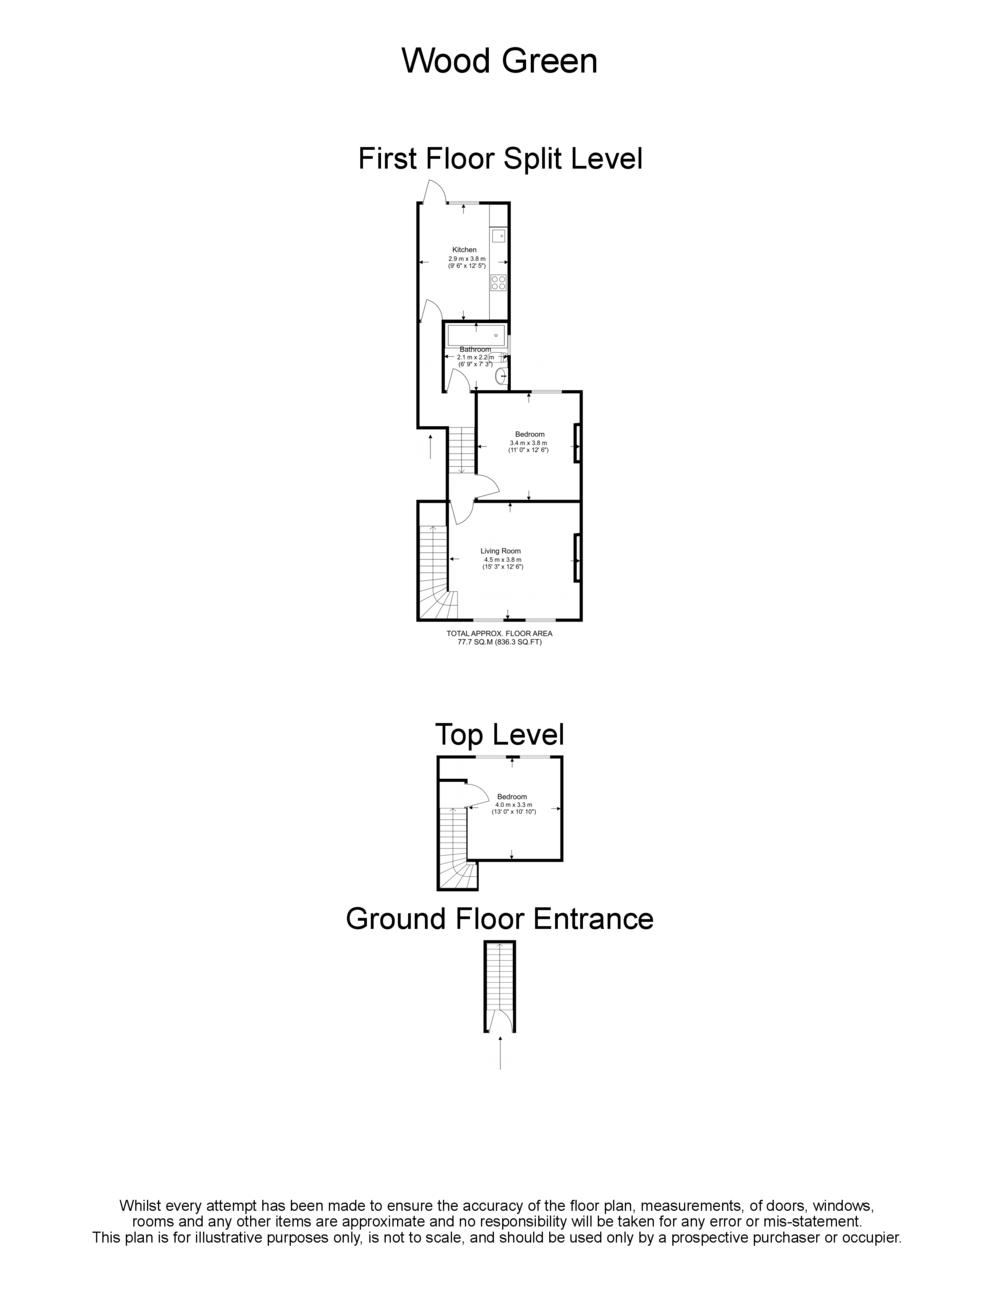 Project letterhead - Wood Green - 2D Floor Plan (8).png